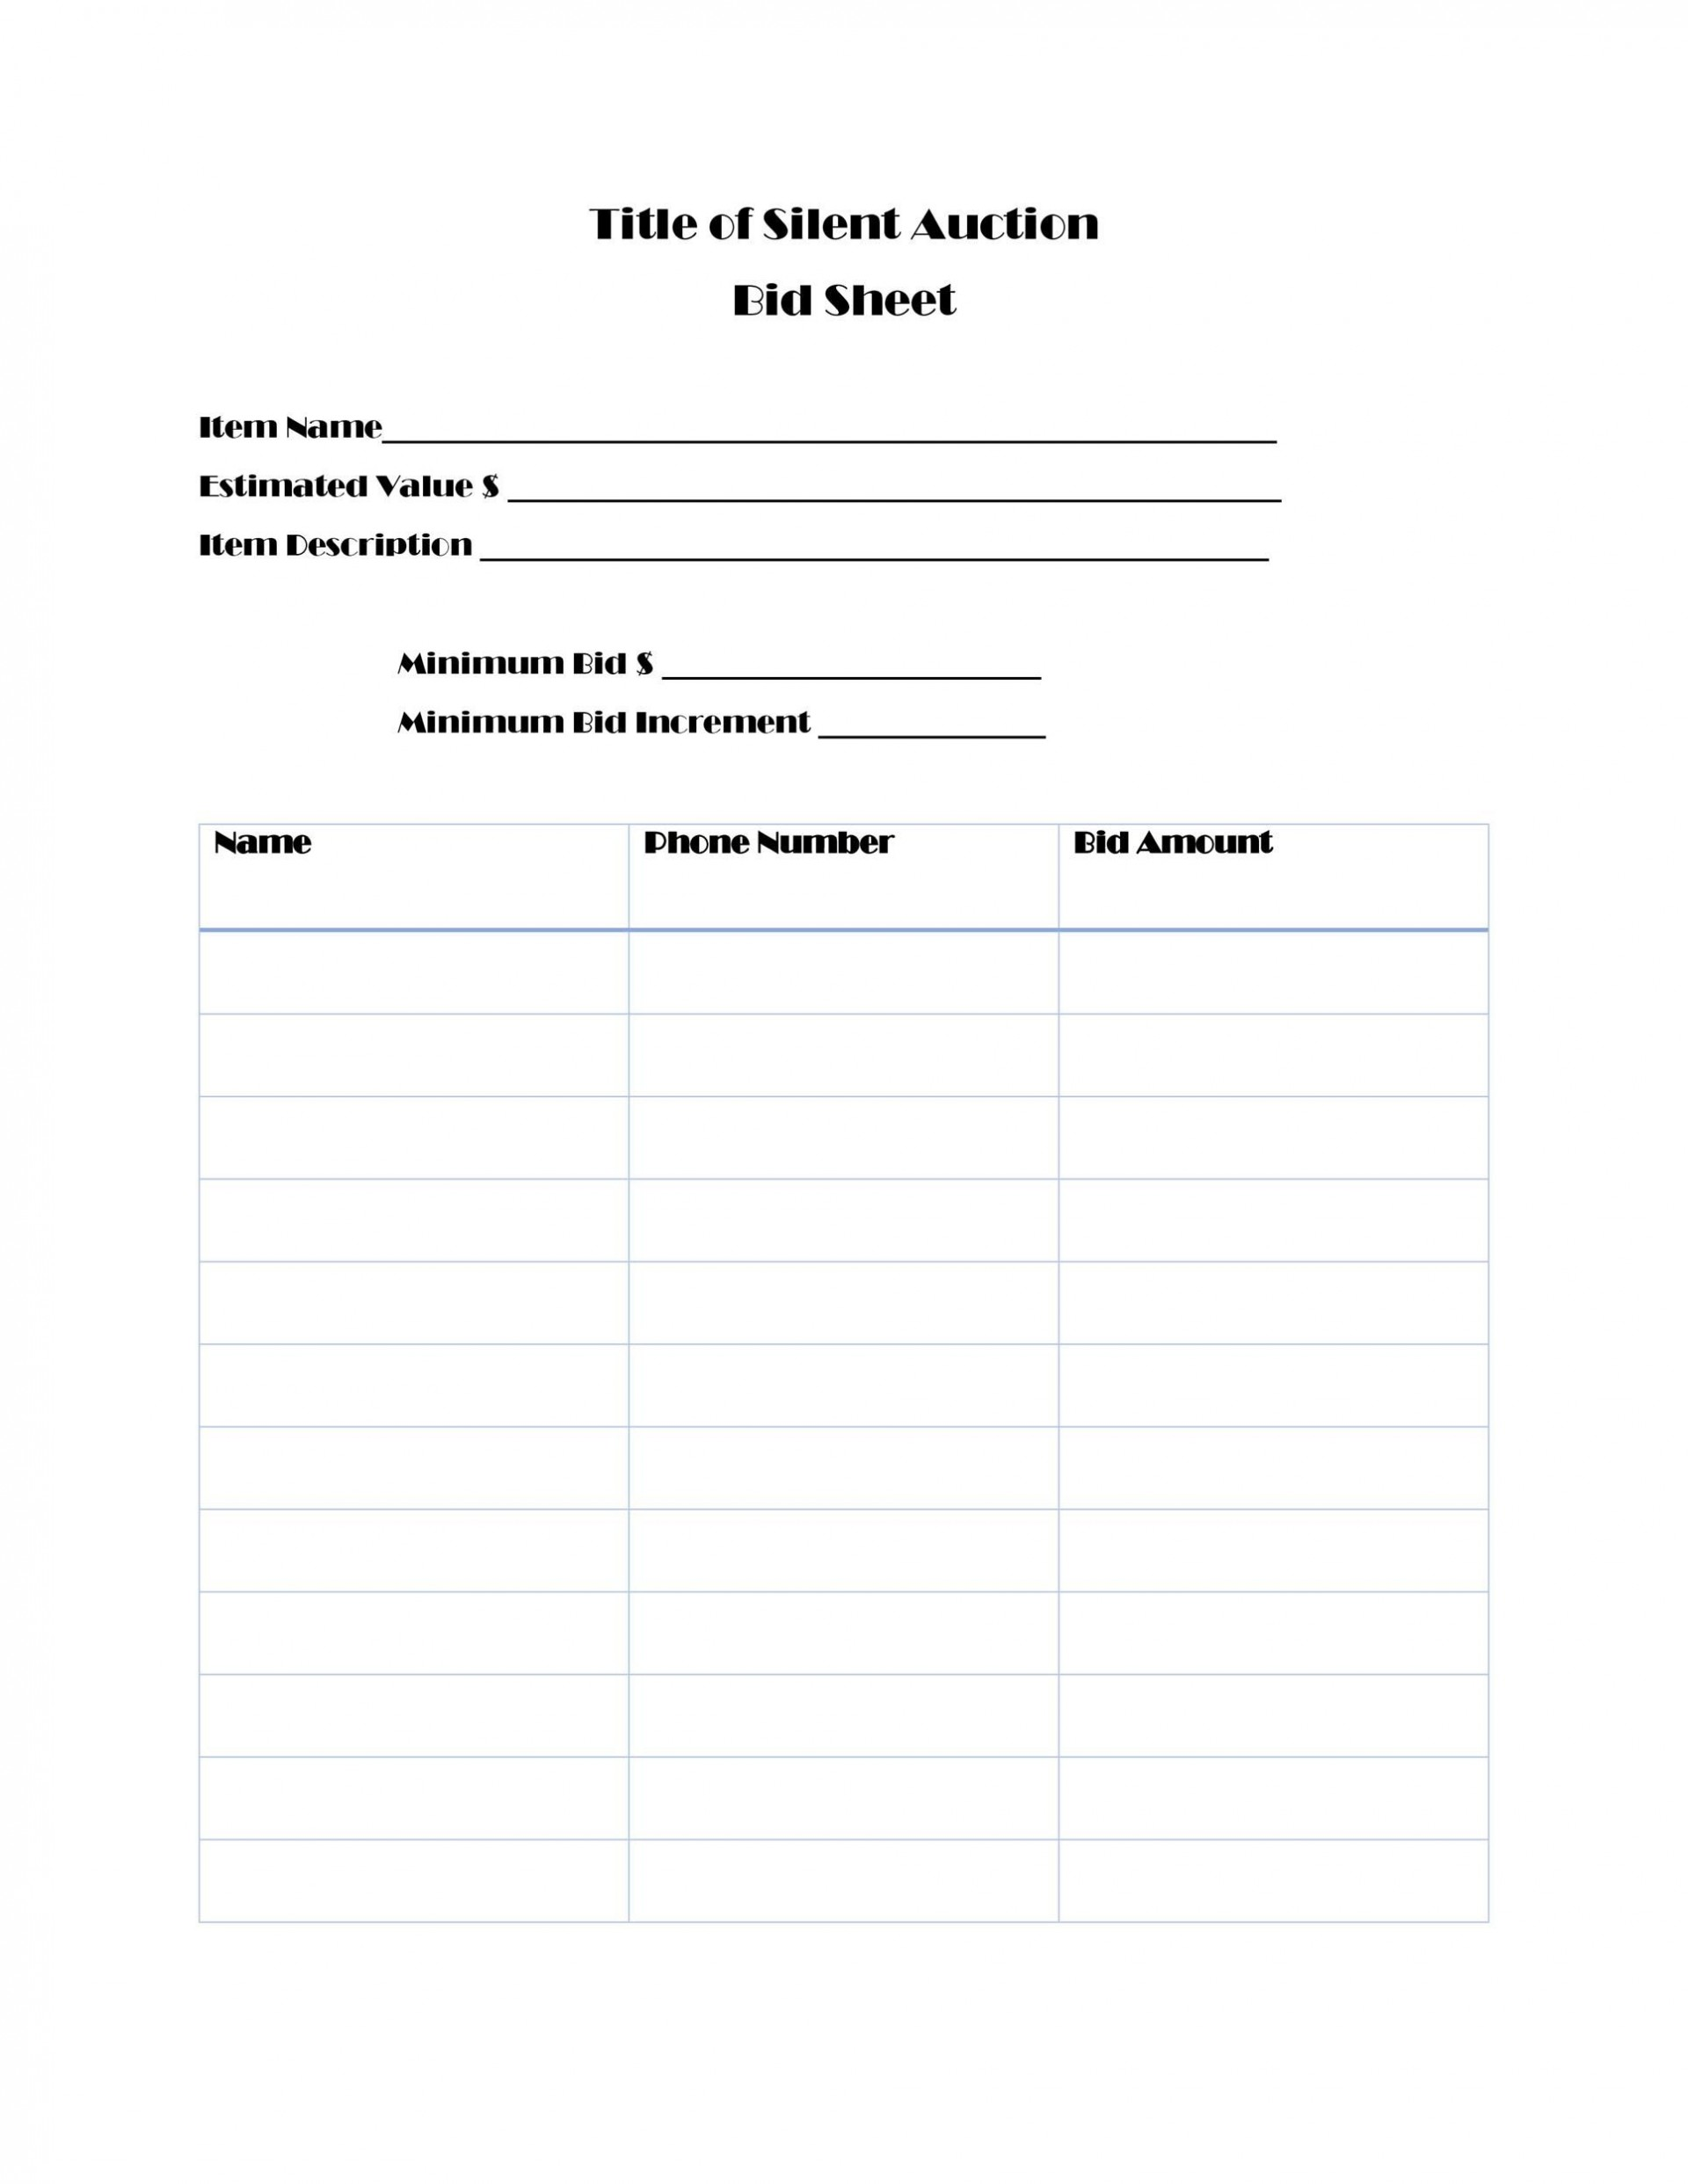 003 Wonderful Silent Auction Bid Sheet Template Free Design  Pdf Download1920